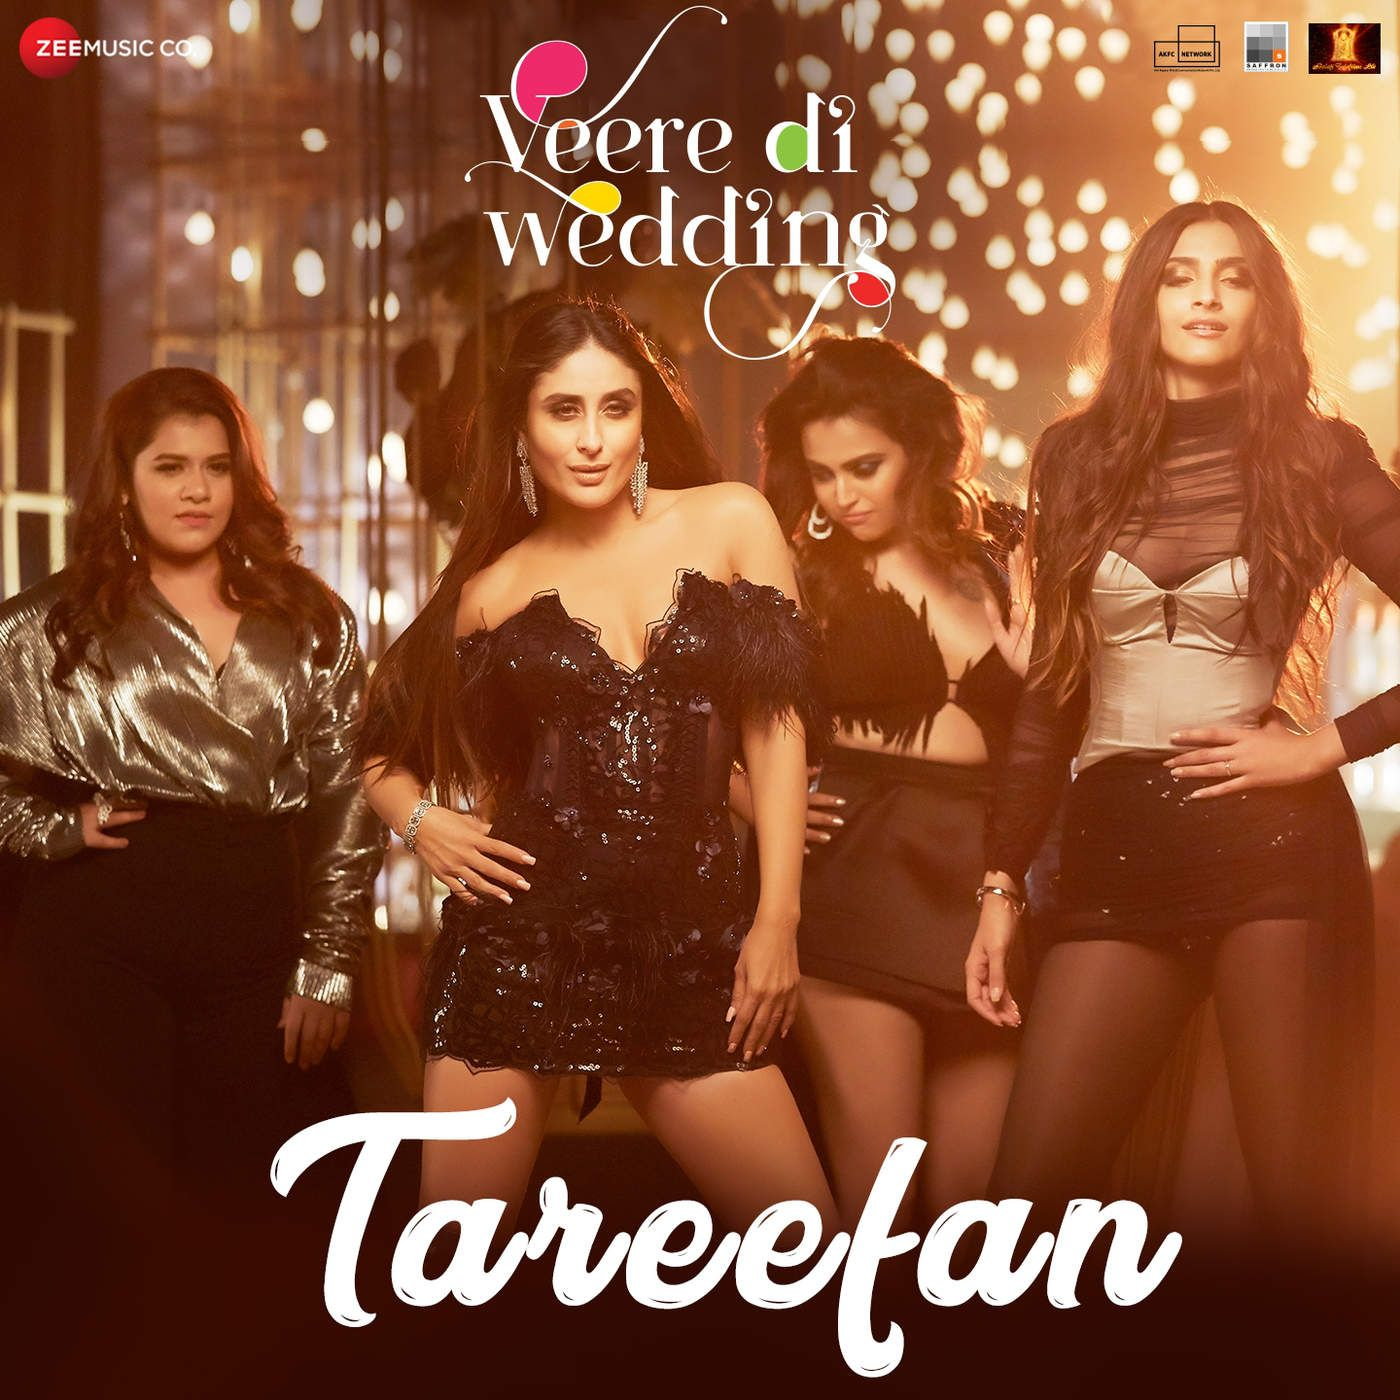 Veere Di Wedding (2018) Movie Mp3 Songs Veere di wedding